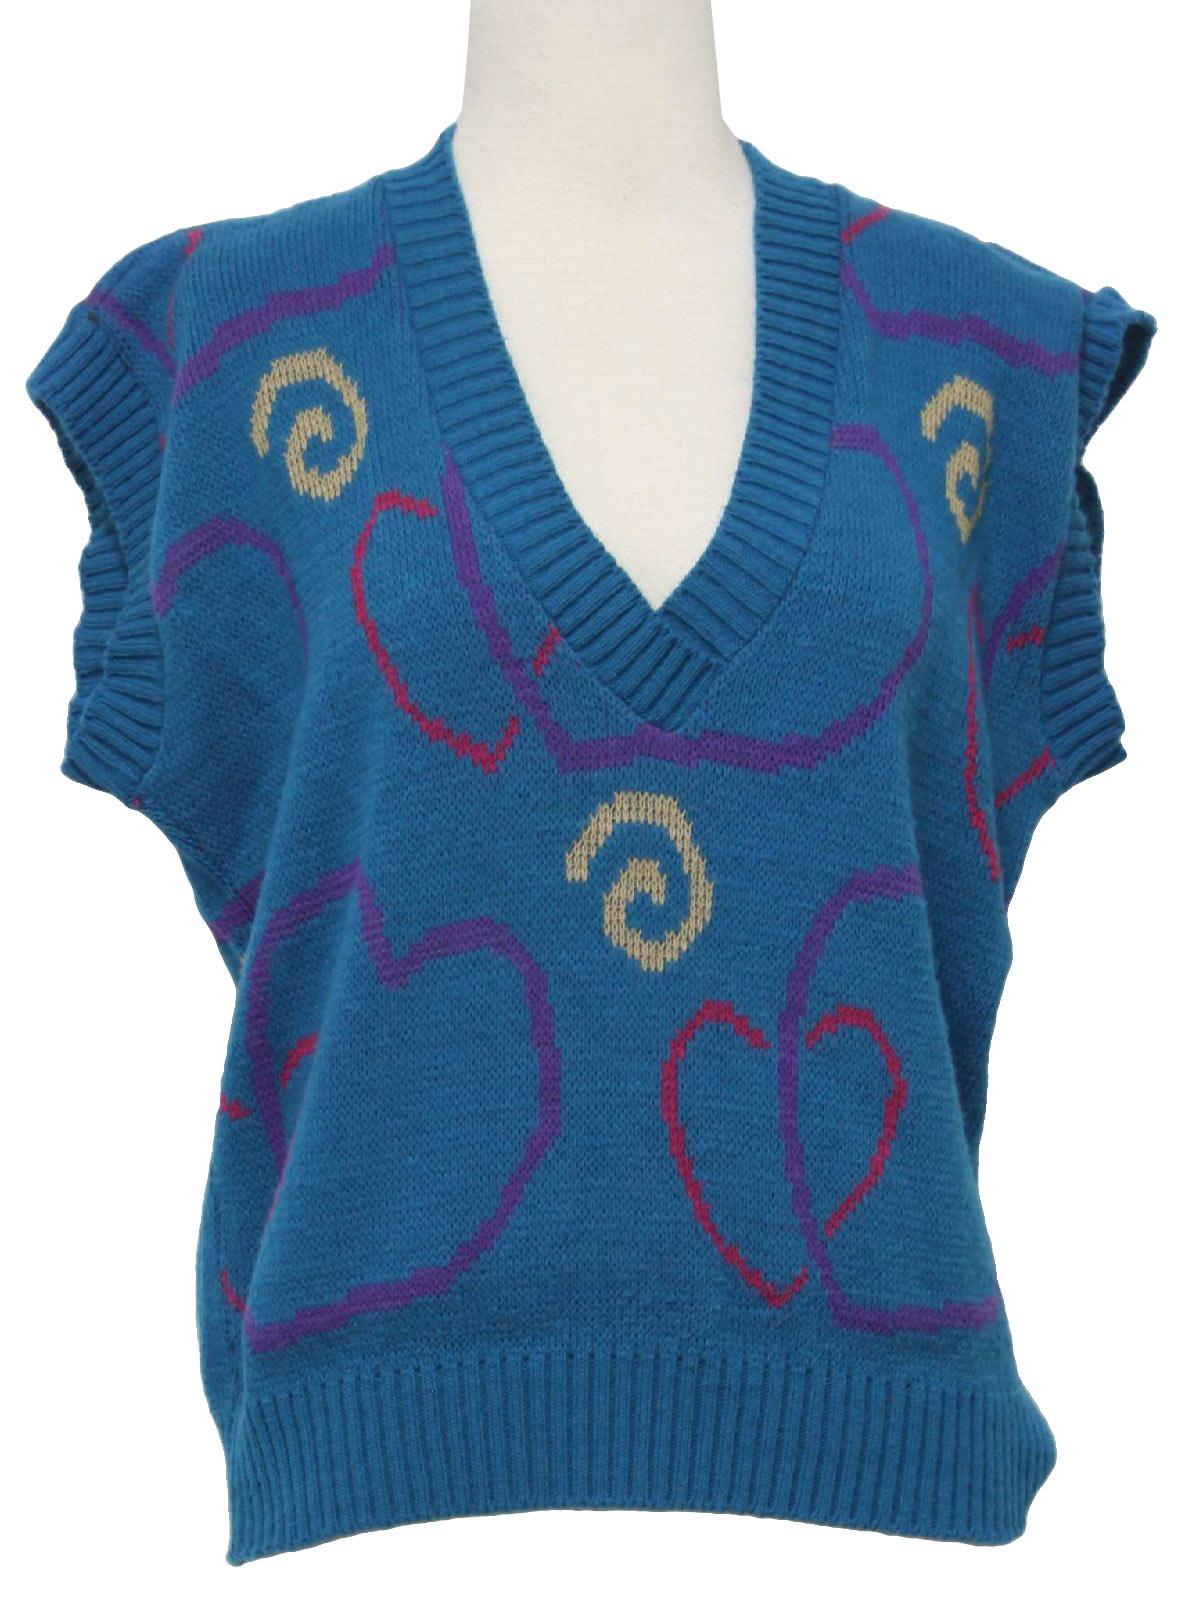 Cabin Creek Sweaters